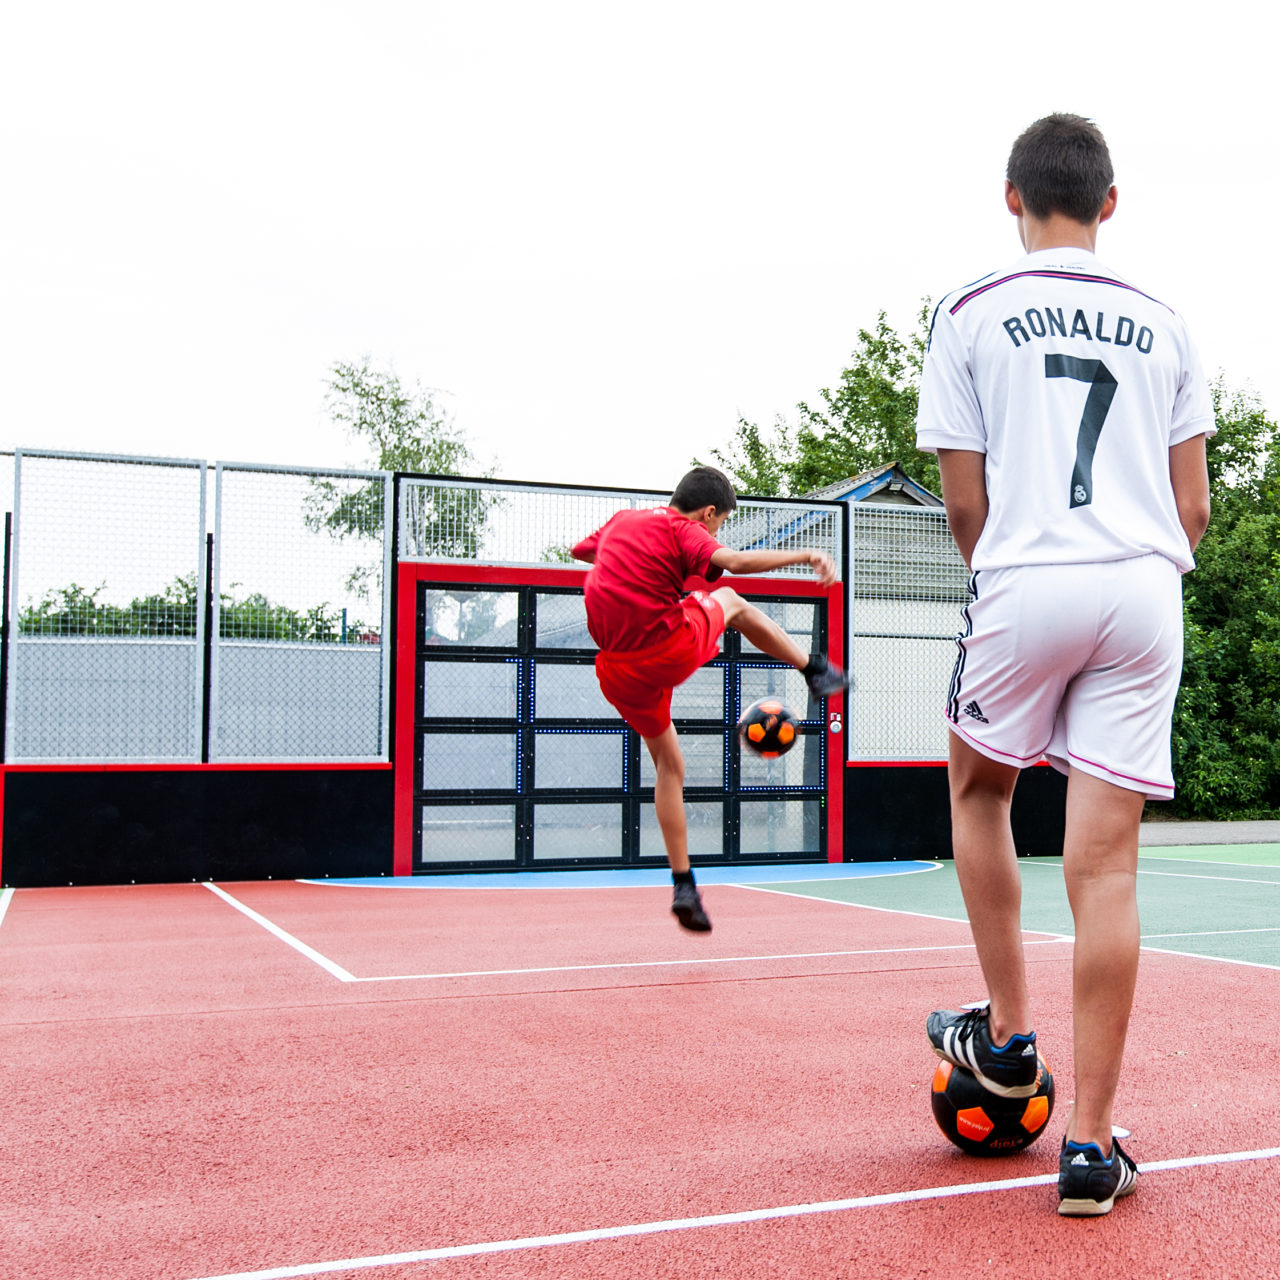 Yalp Sutu - Fußballwand - Auf dem Campingplatz